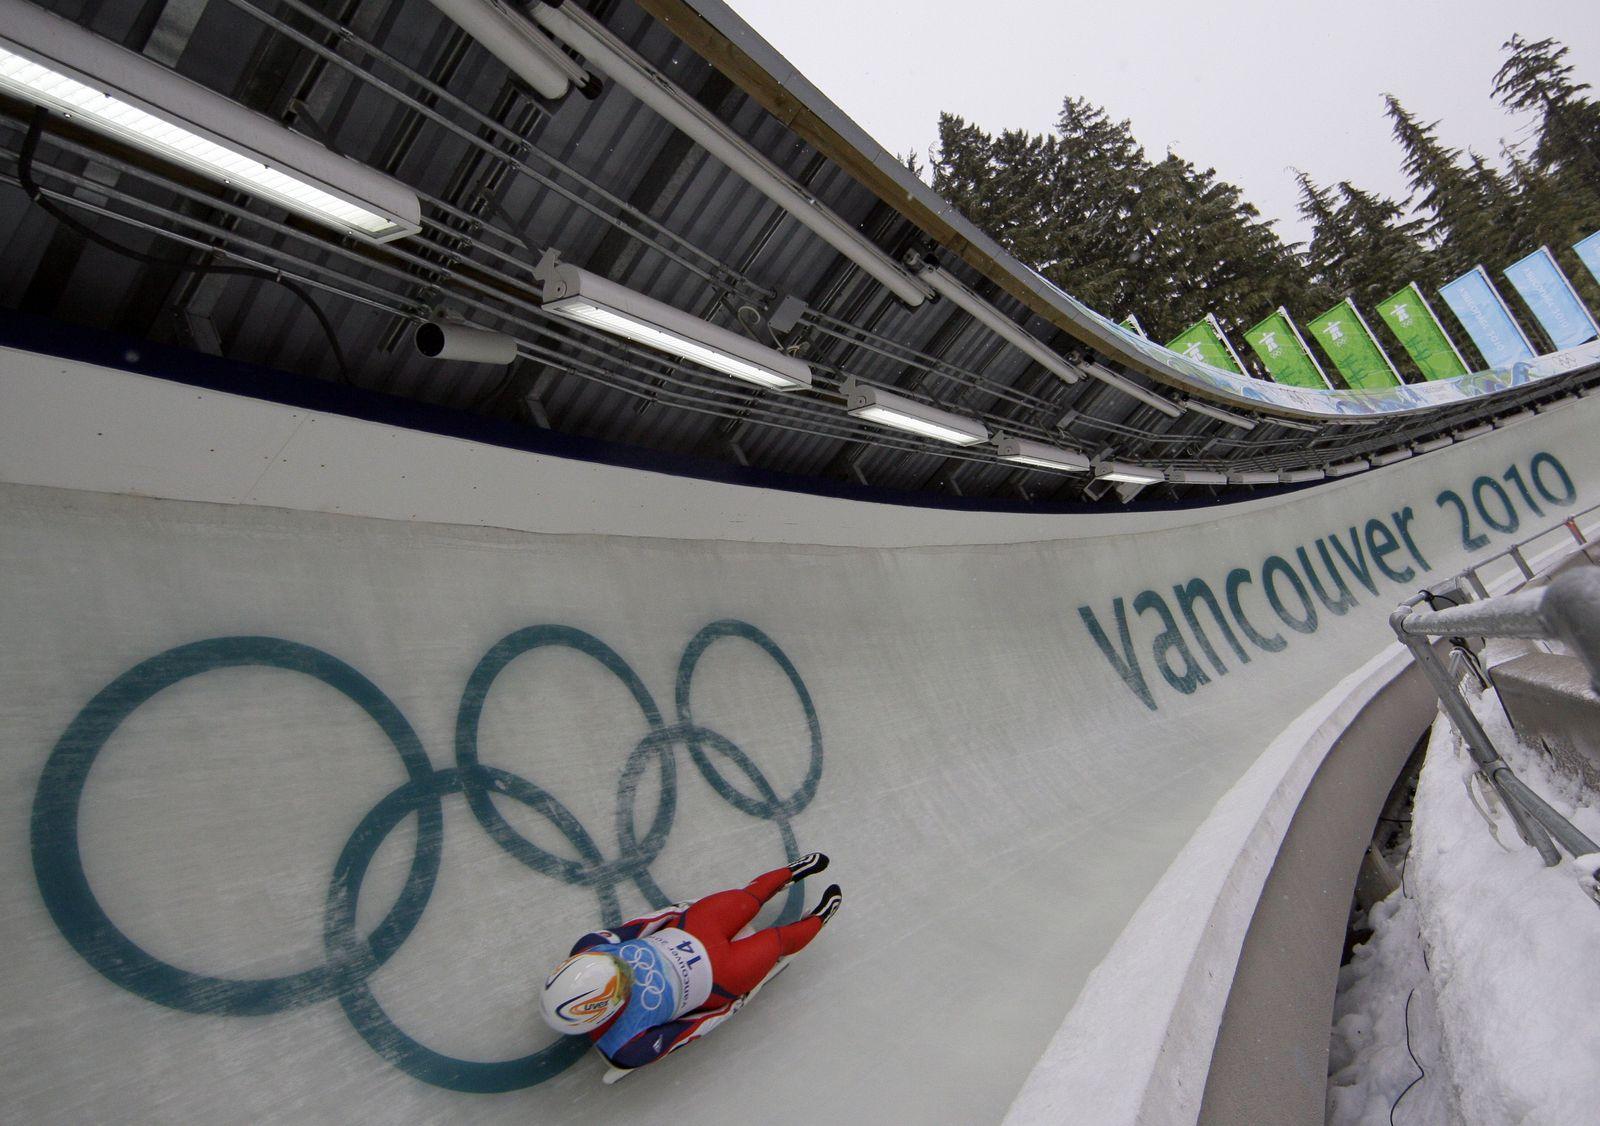 Vancouver Olympics Luge rodelbahn II